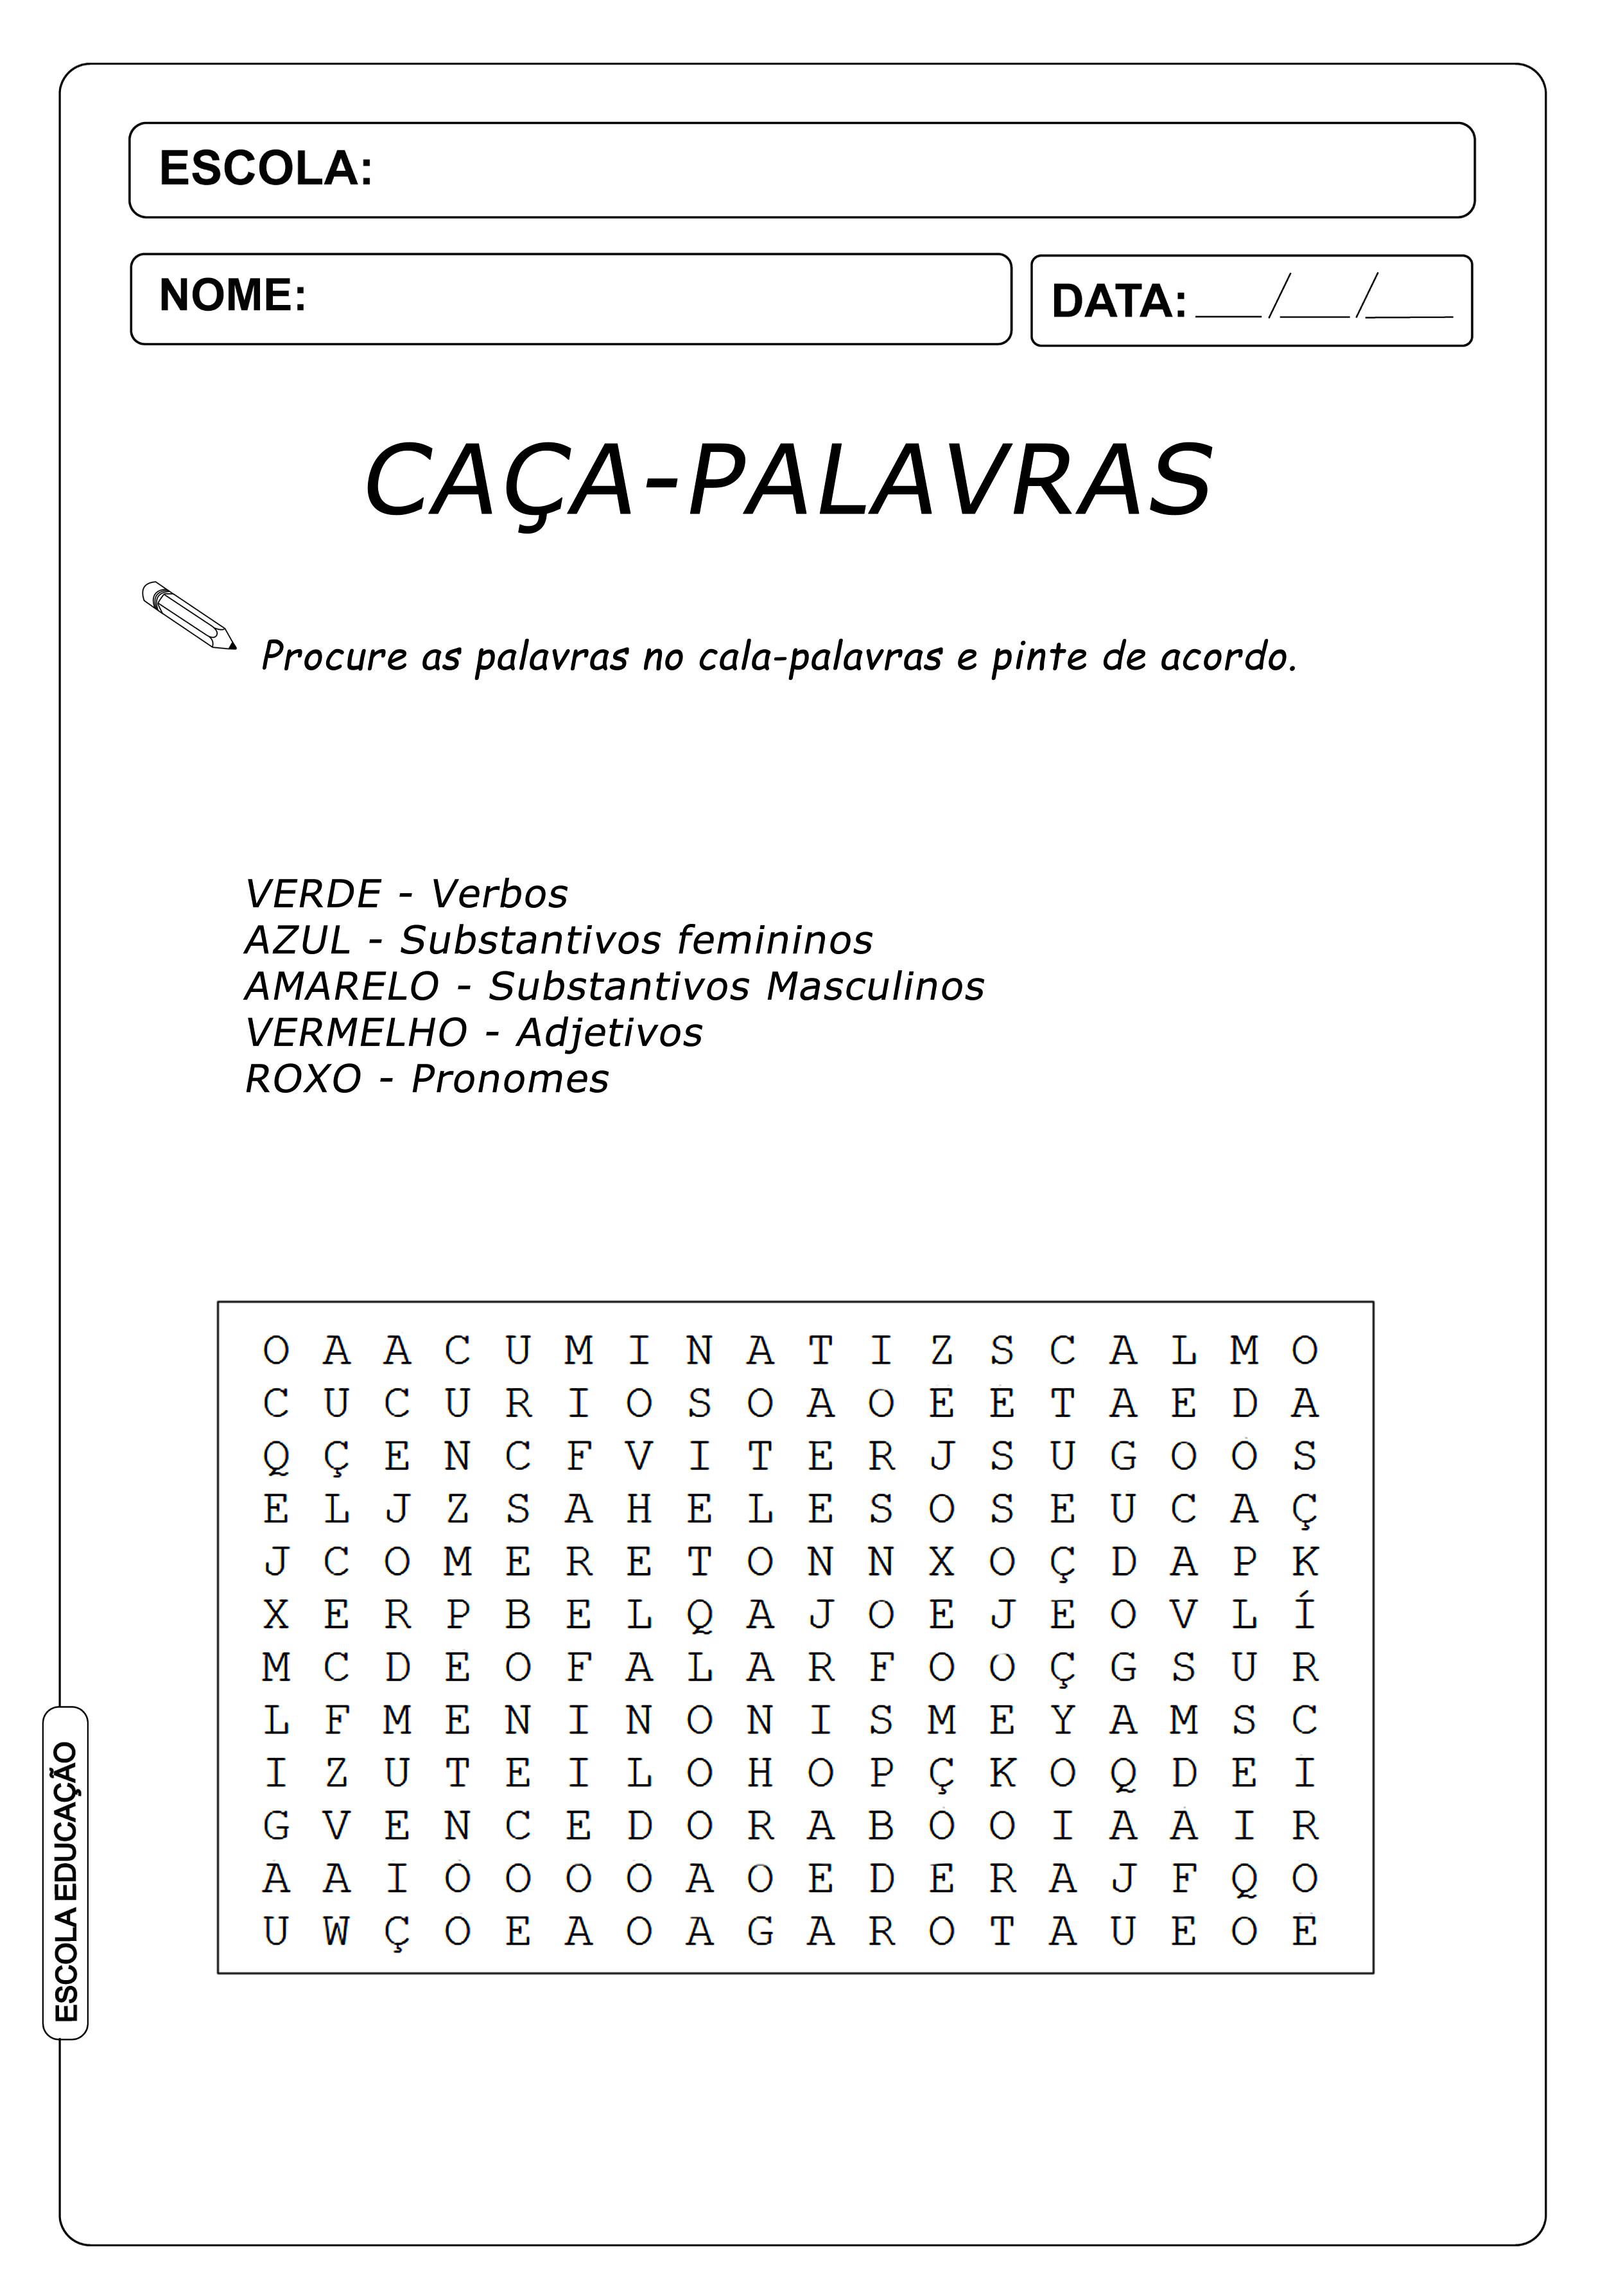 Atividades Caça Palavras 4º ano – Pinte as Palavras de Acordo – Caça-Palavras de Português